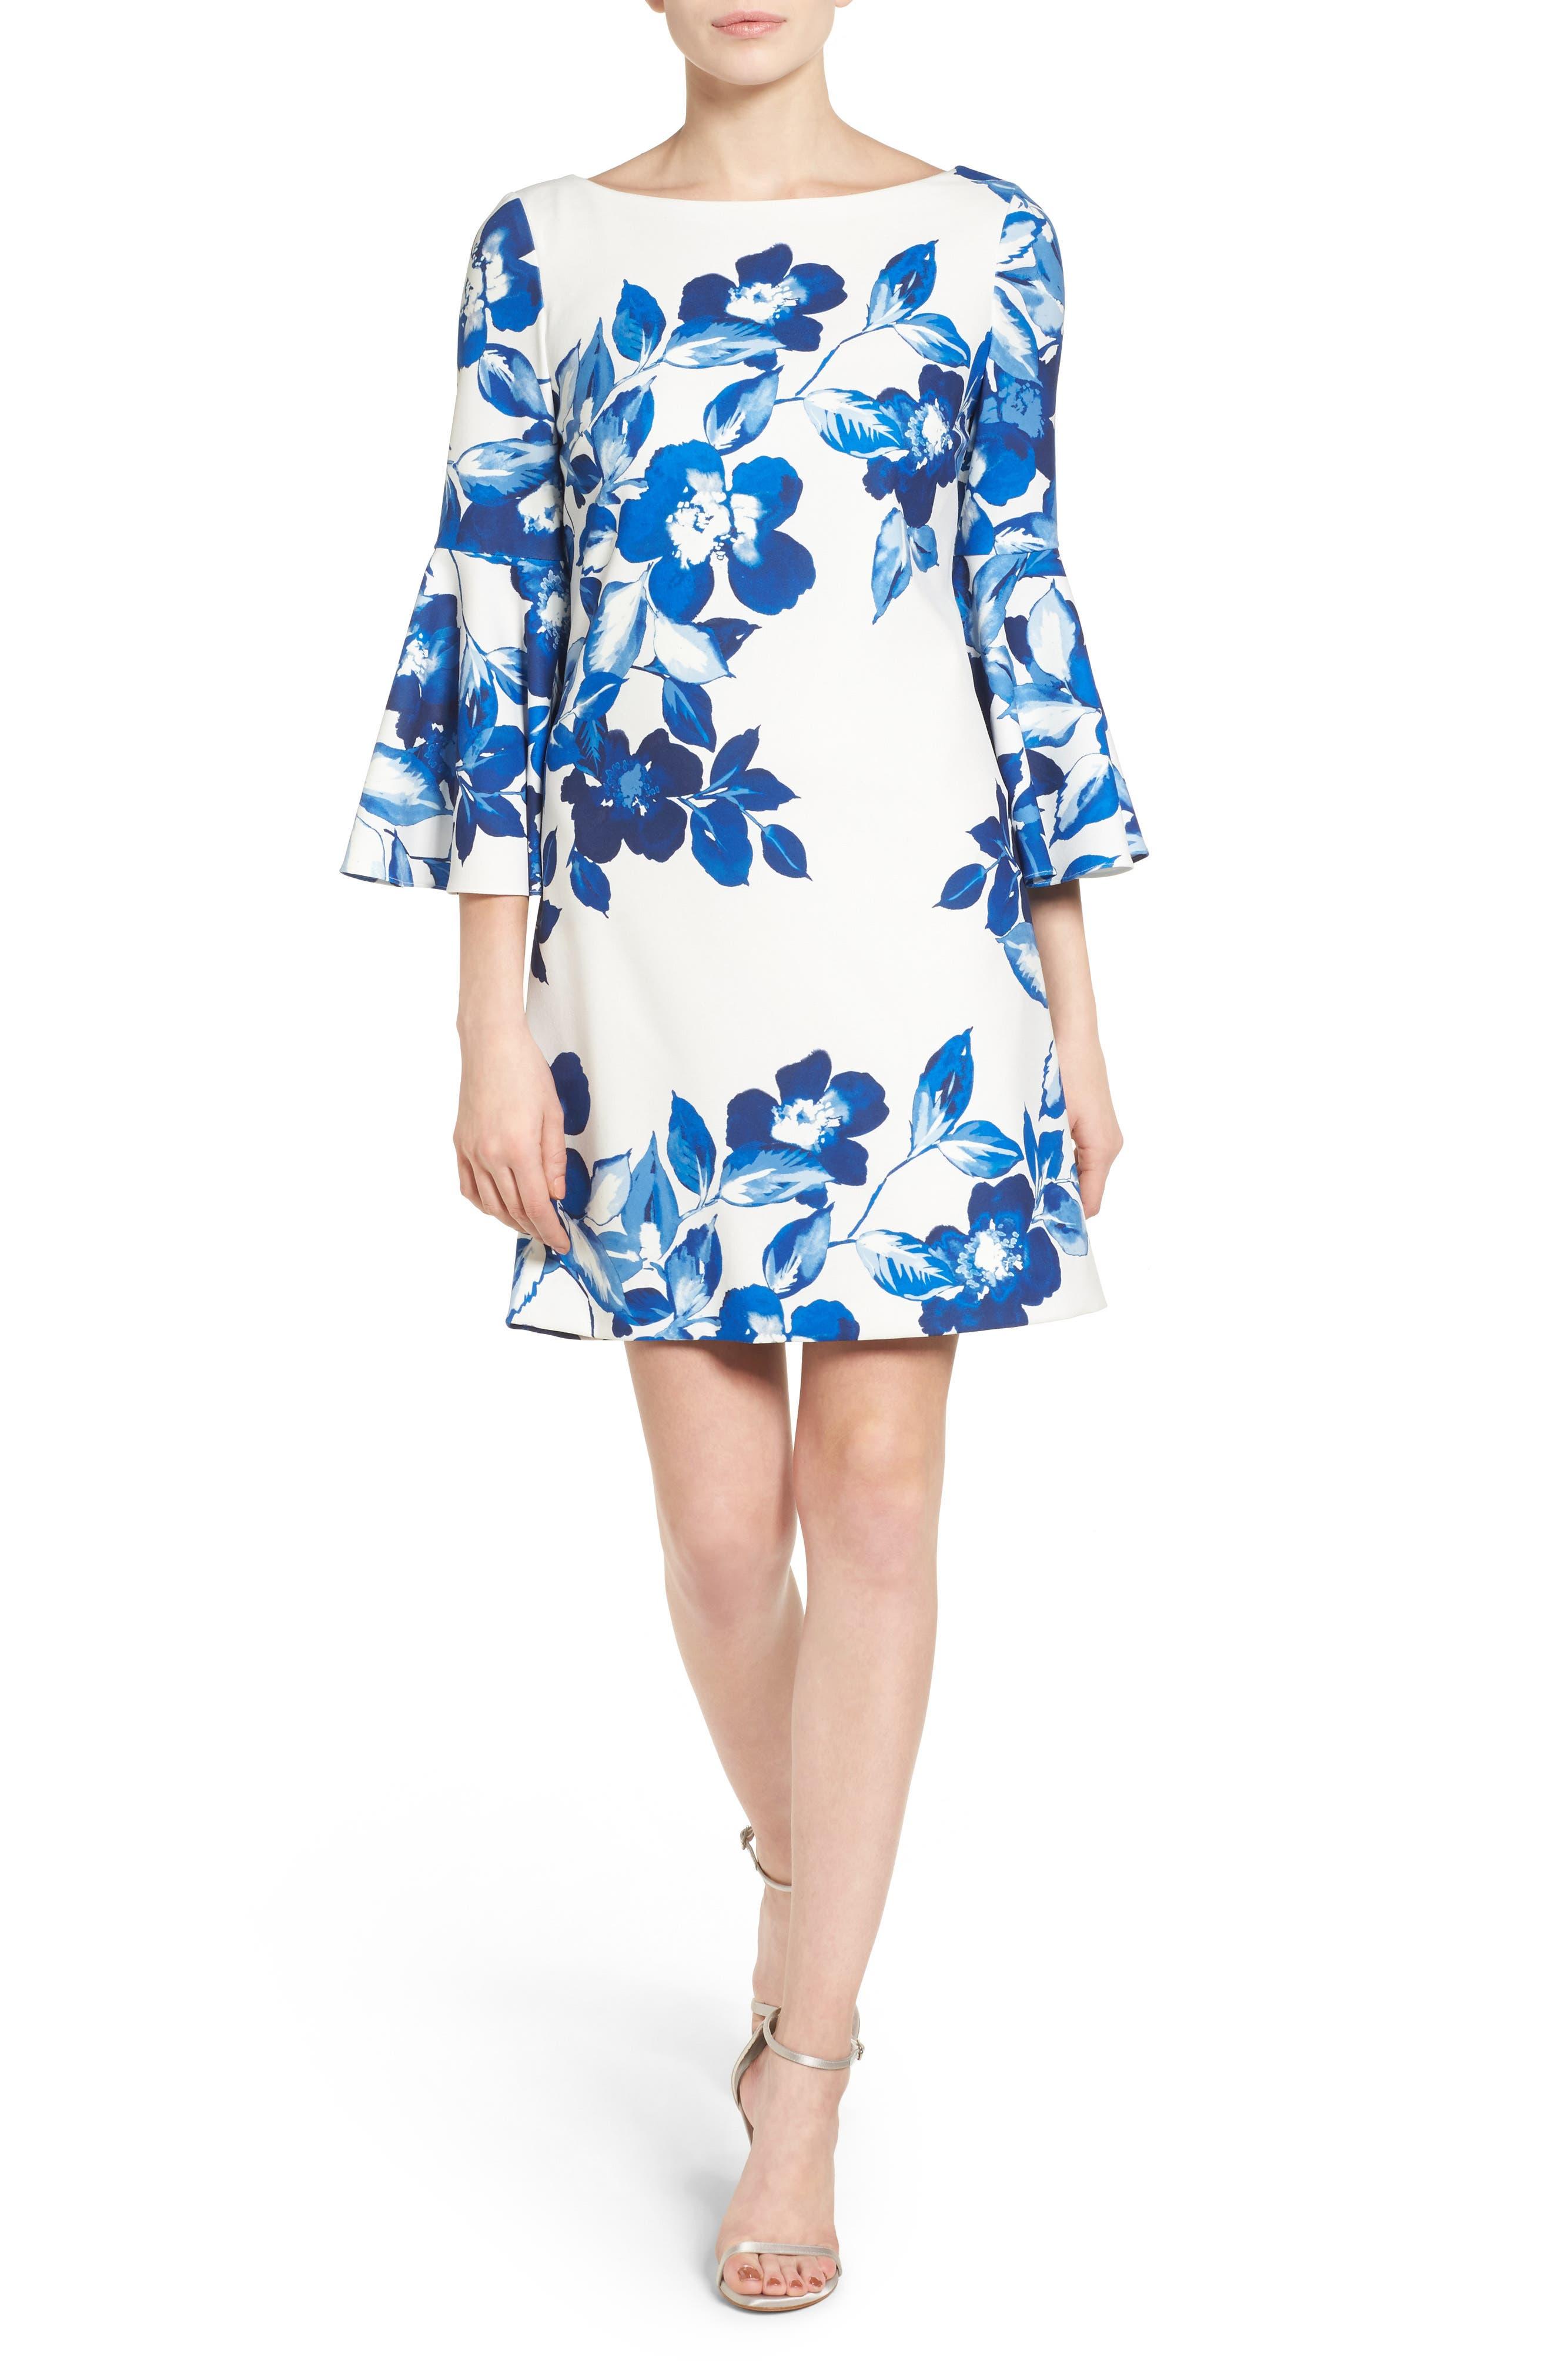 Floral Shift Dress,                             Main thumbnail 1, color,                             BLUE/ IVORY